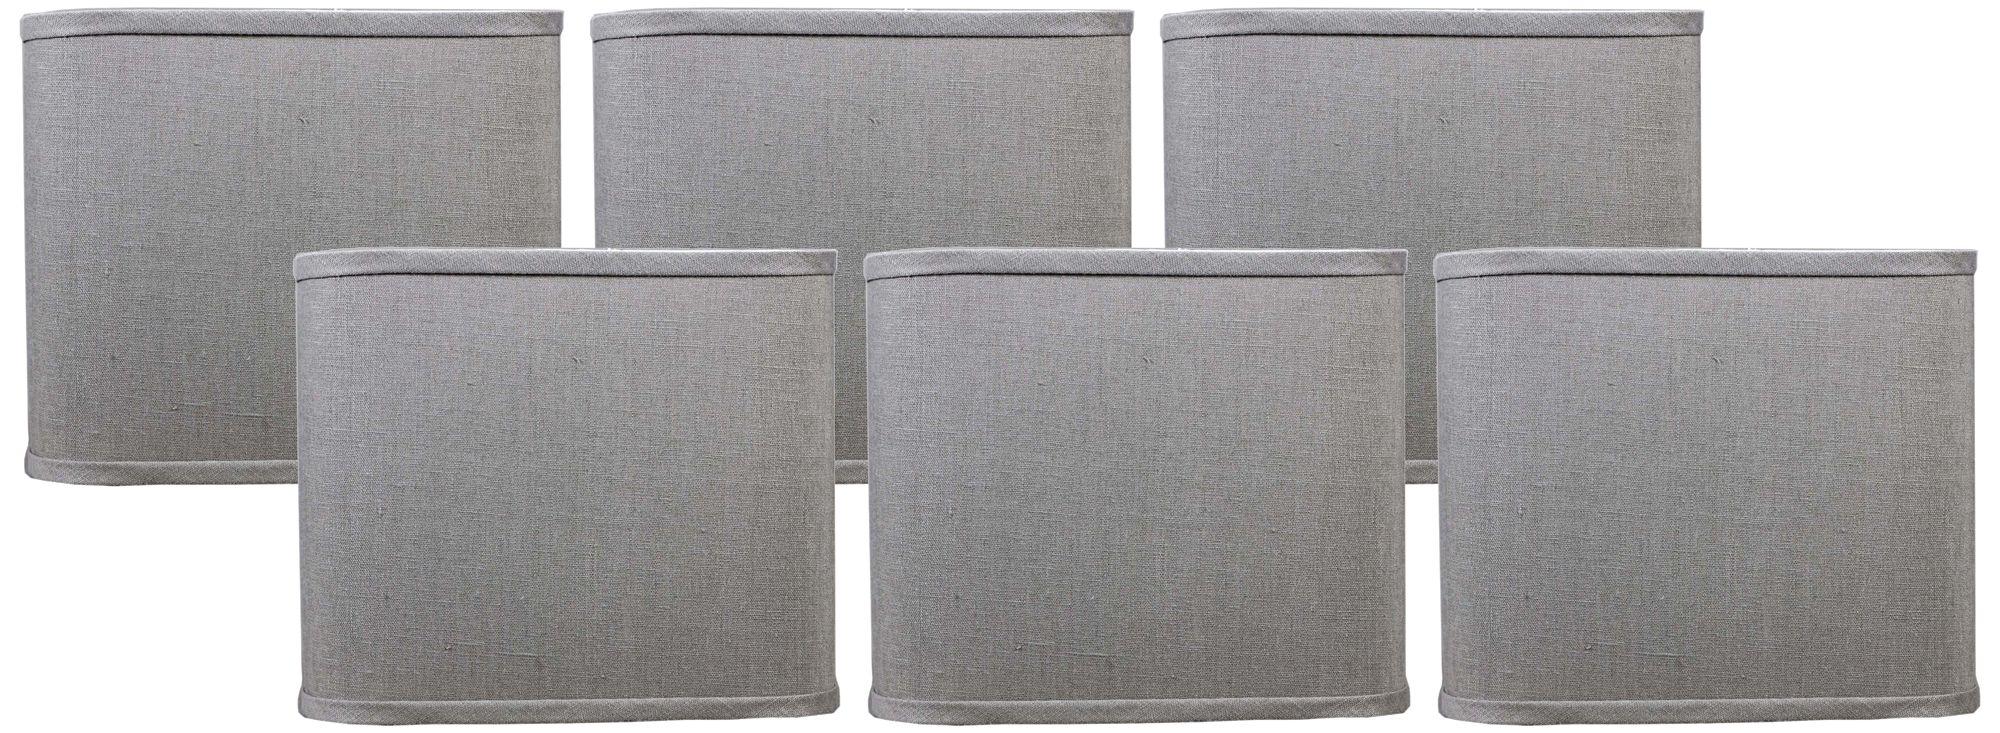 true gray linen set of 6 square lamp shades 5x5x5 clipon